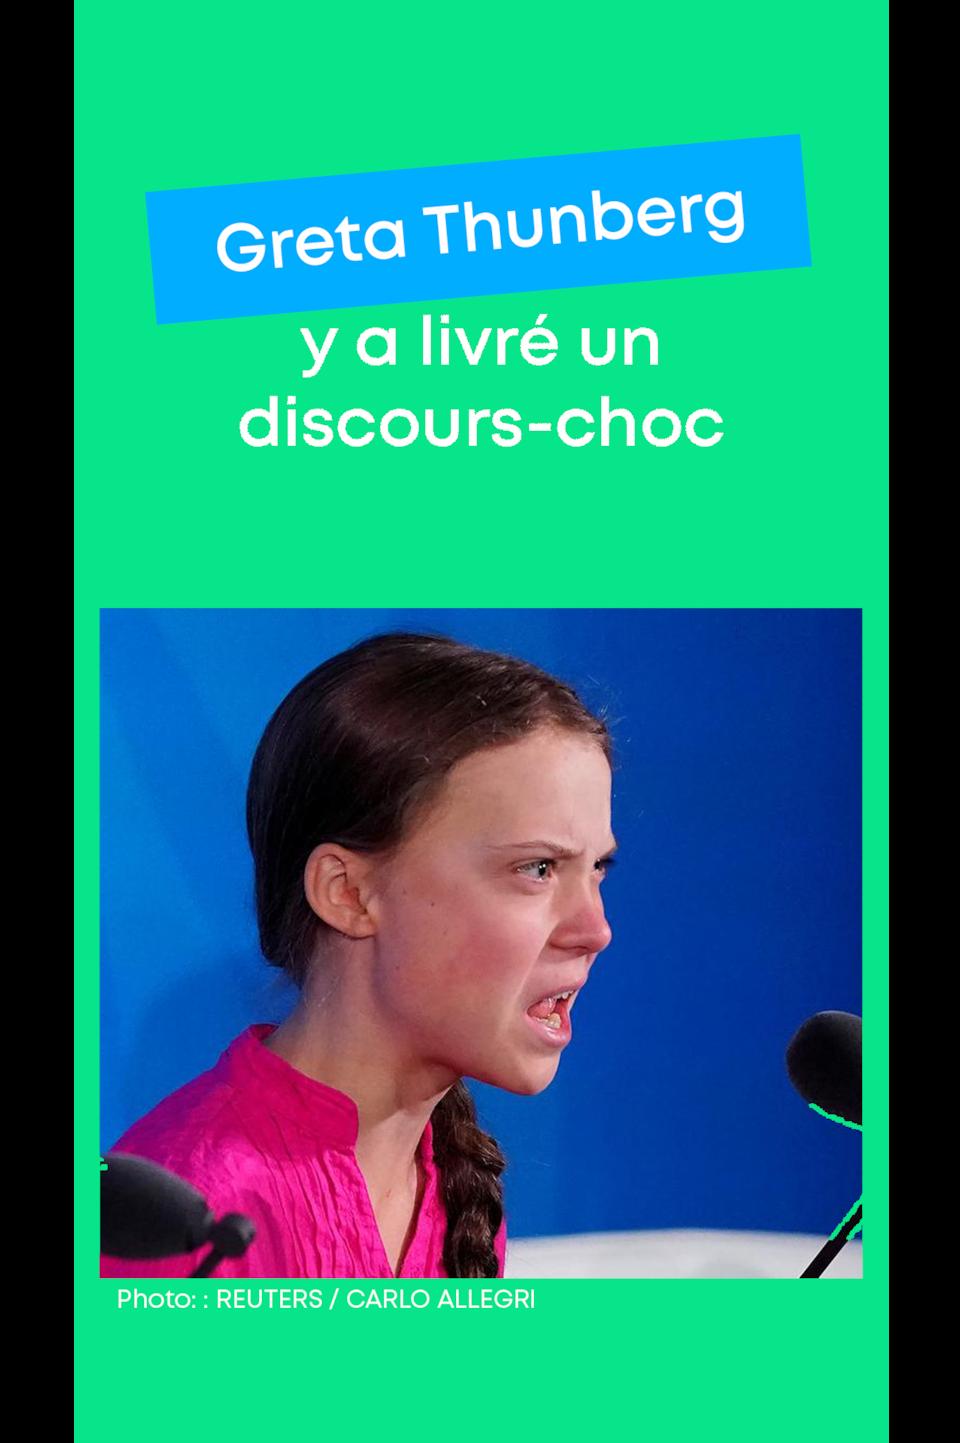 Greta Thunberg y a livré un discours-choc.